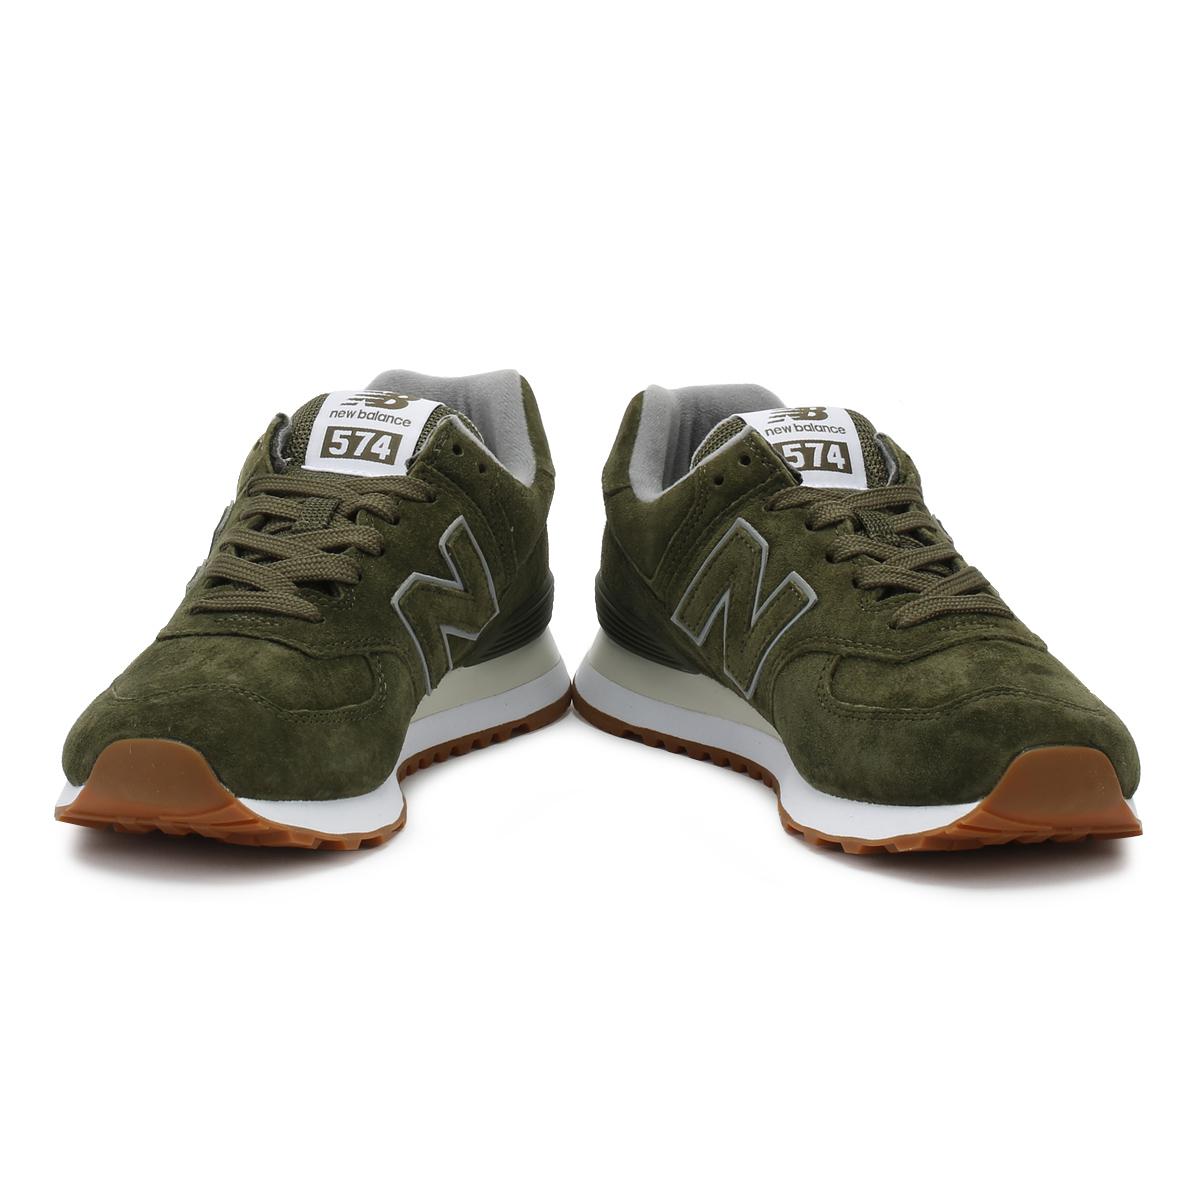 cbcbae5e87c New Balance Mens Trainers Dark Covert Green 574 Classic Sport Casual Shoes